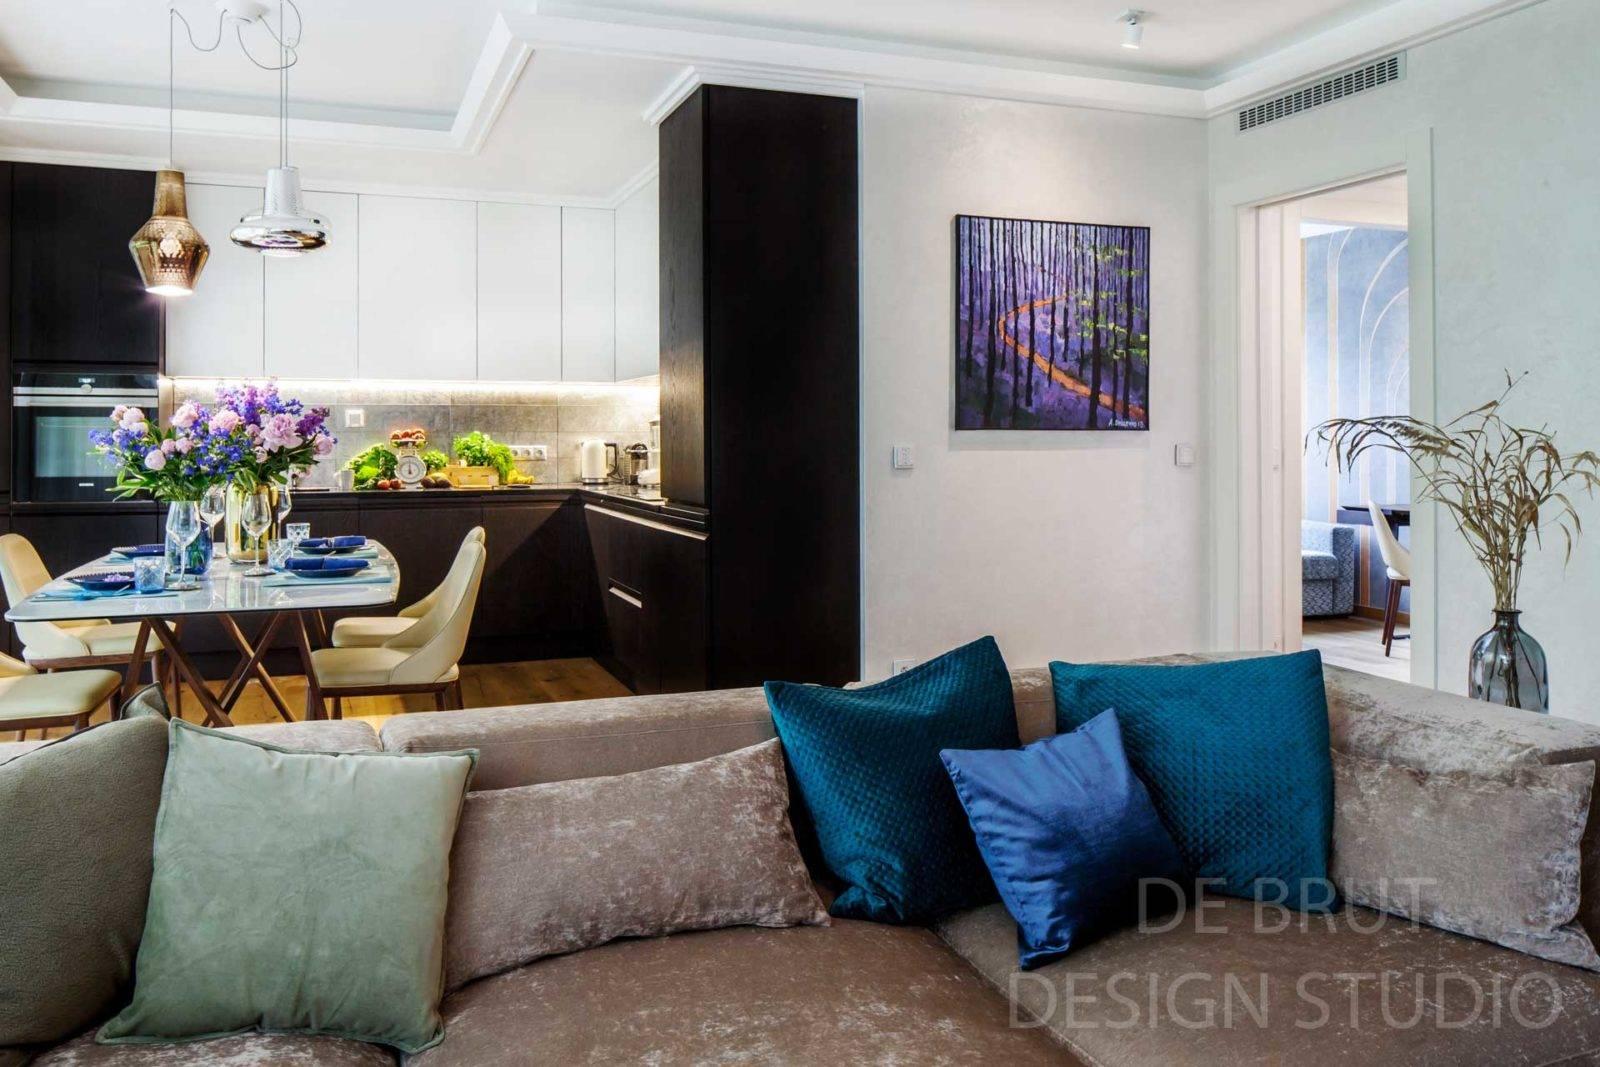 design-interieru-praha-alex-brut-studio-6